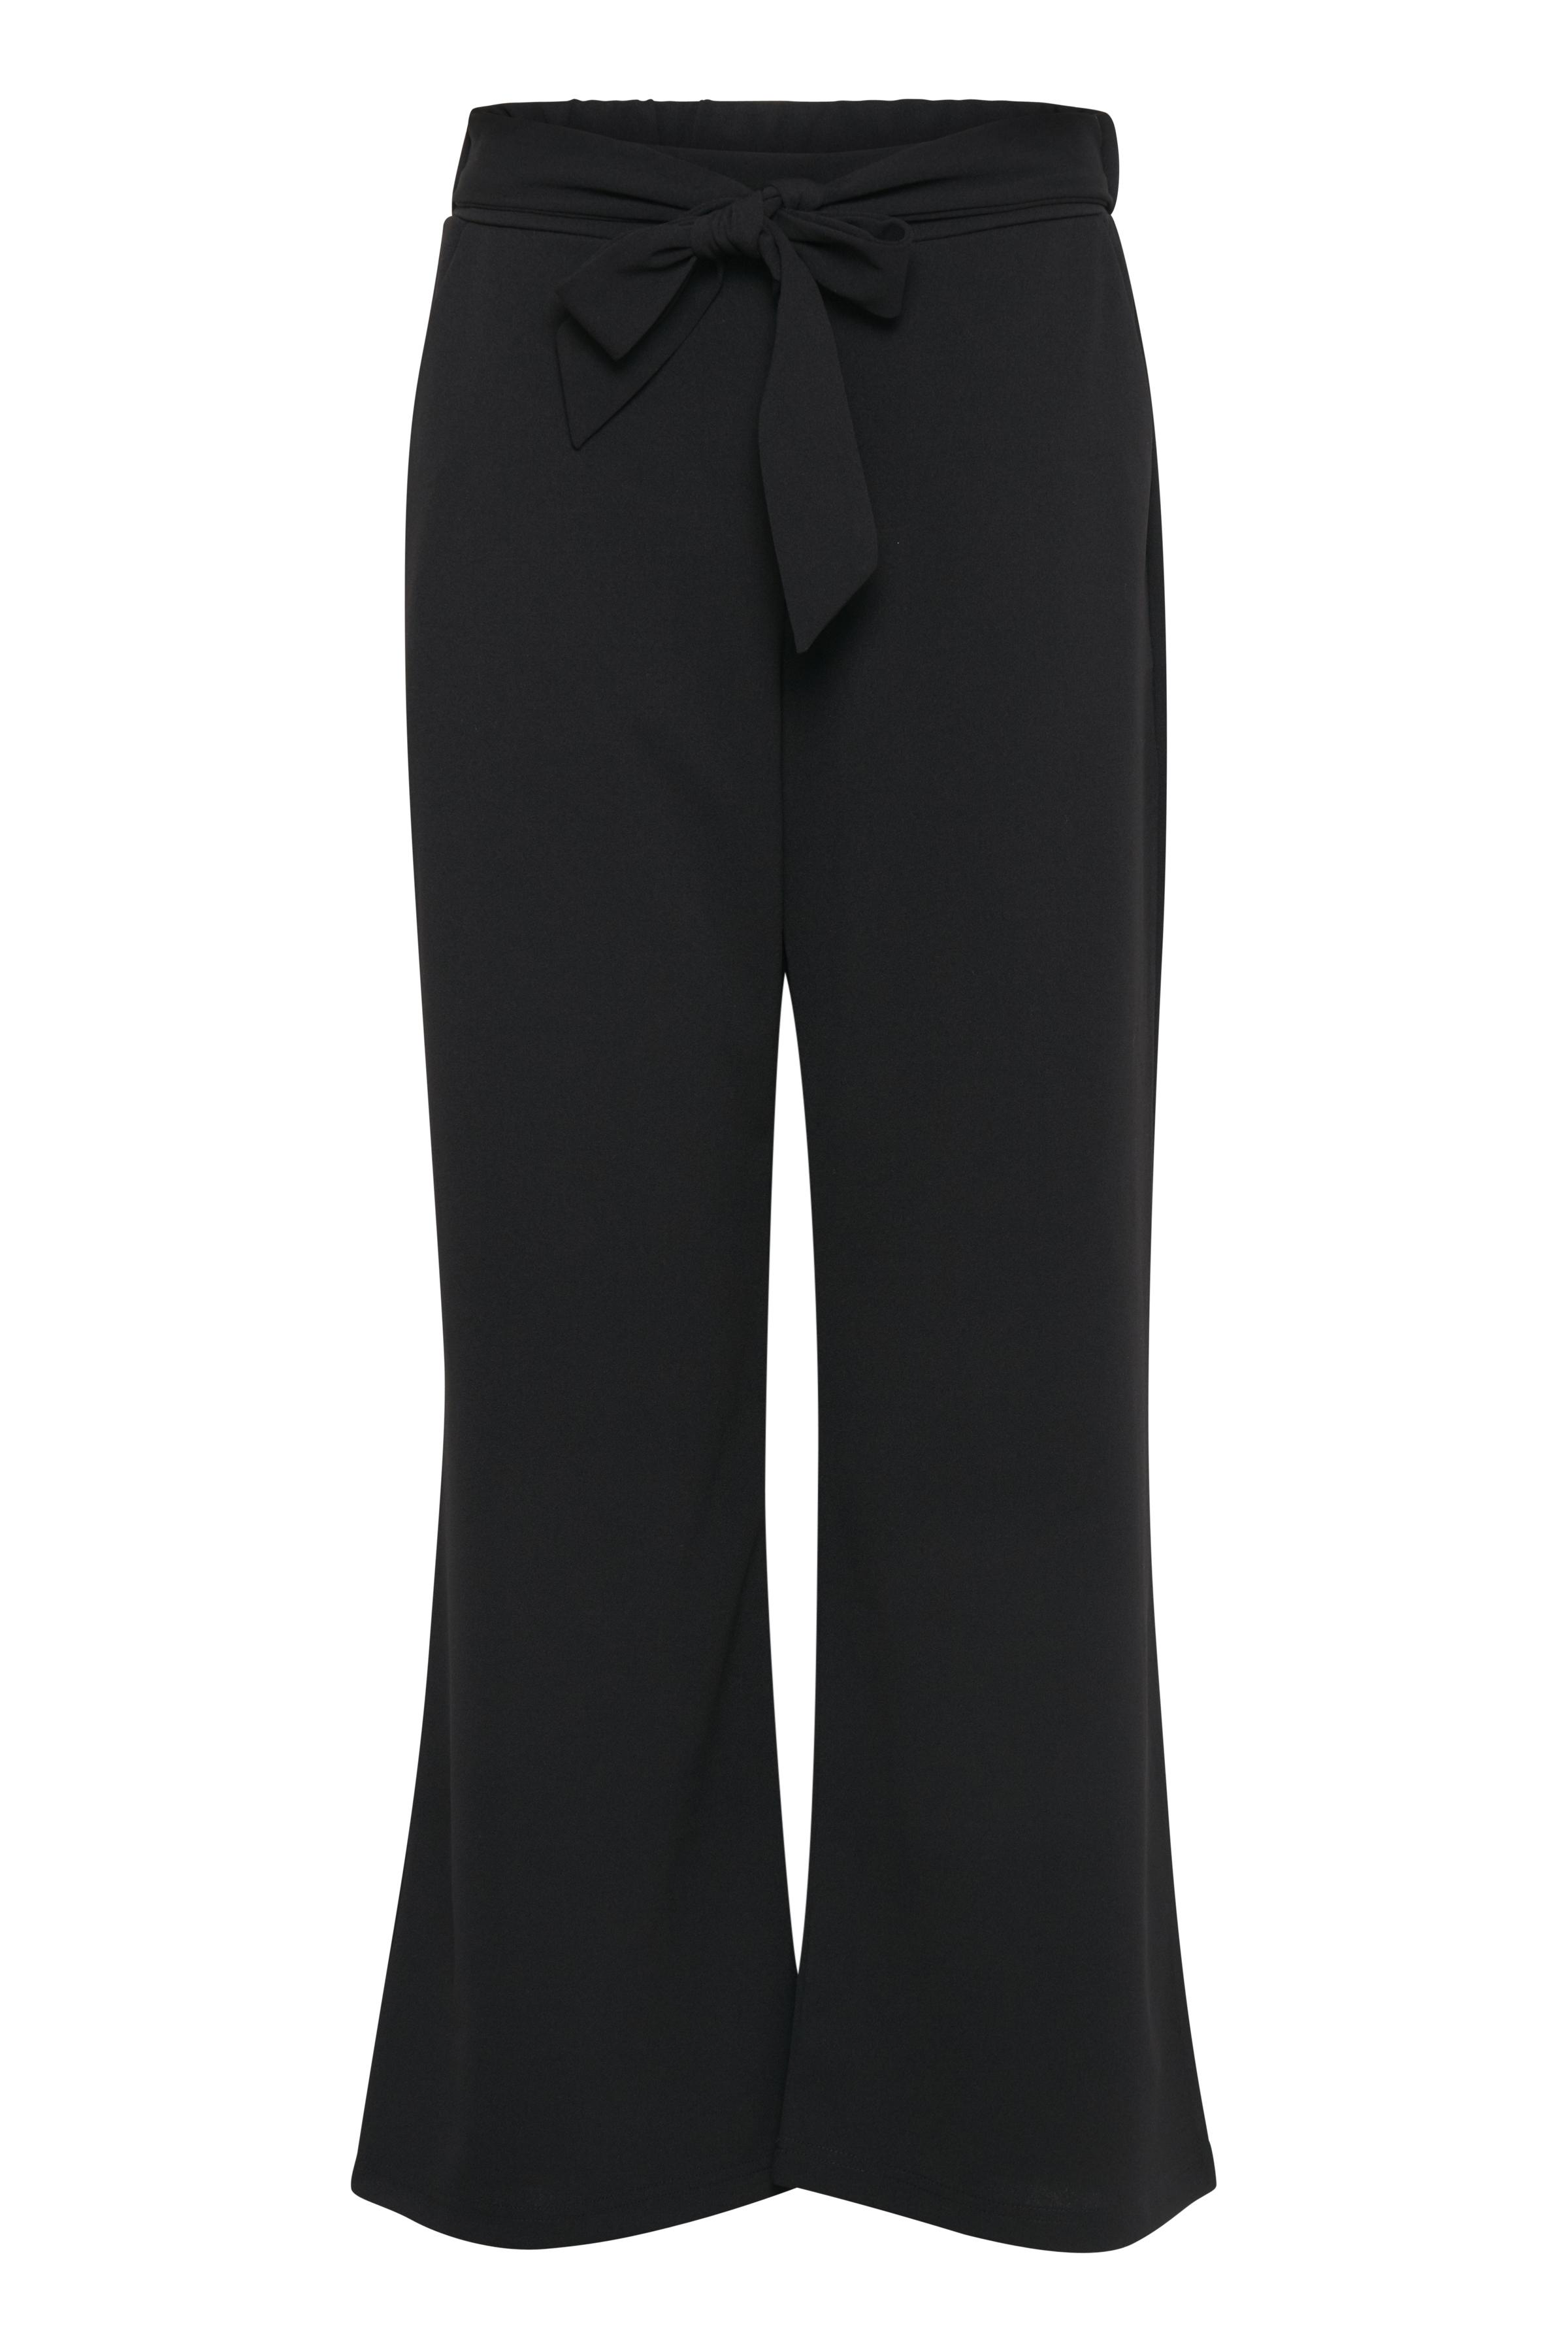 Black Pants Casual von b.young – Kaufen Sie Black Pants Casual aus Größe XS-XXL hier